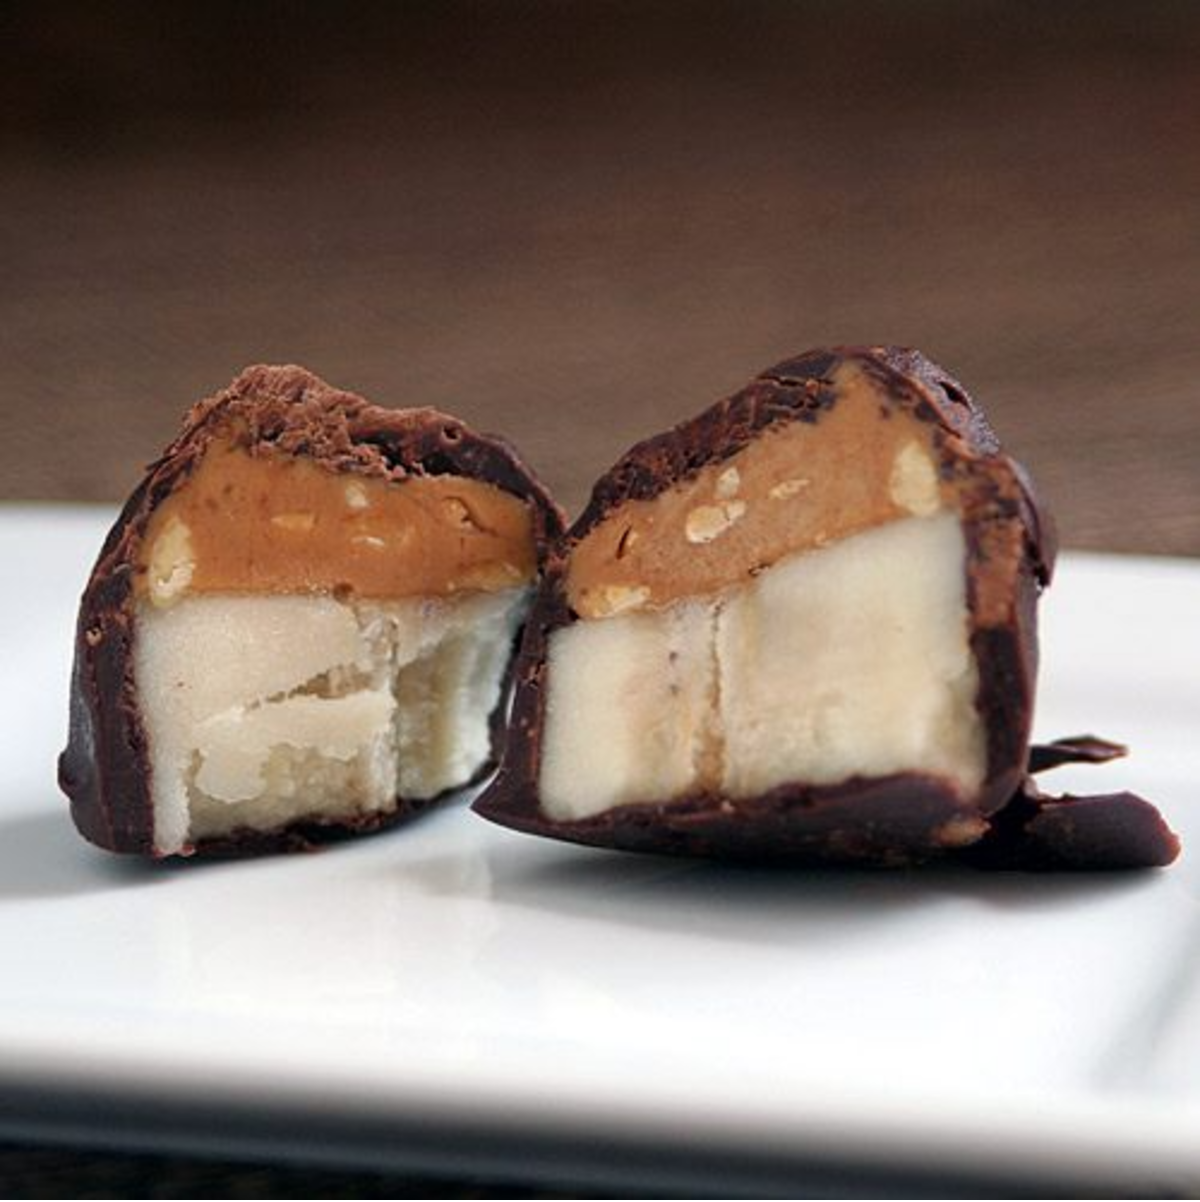 peanut butter banana bites cut in half